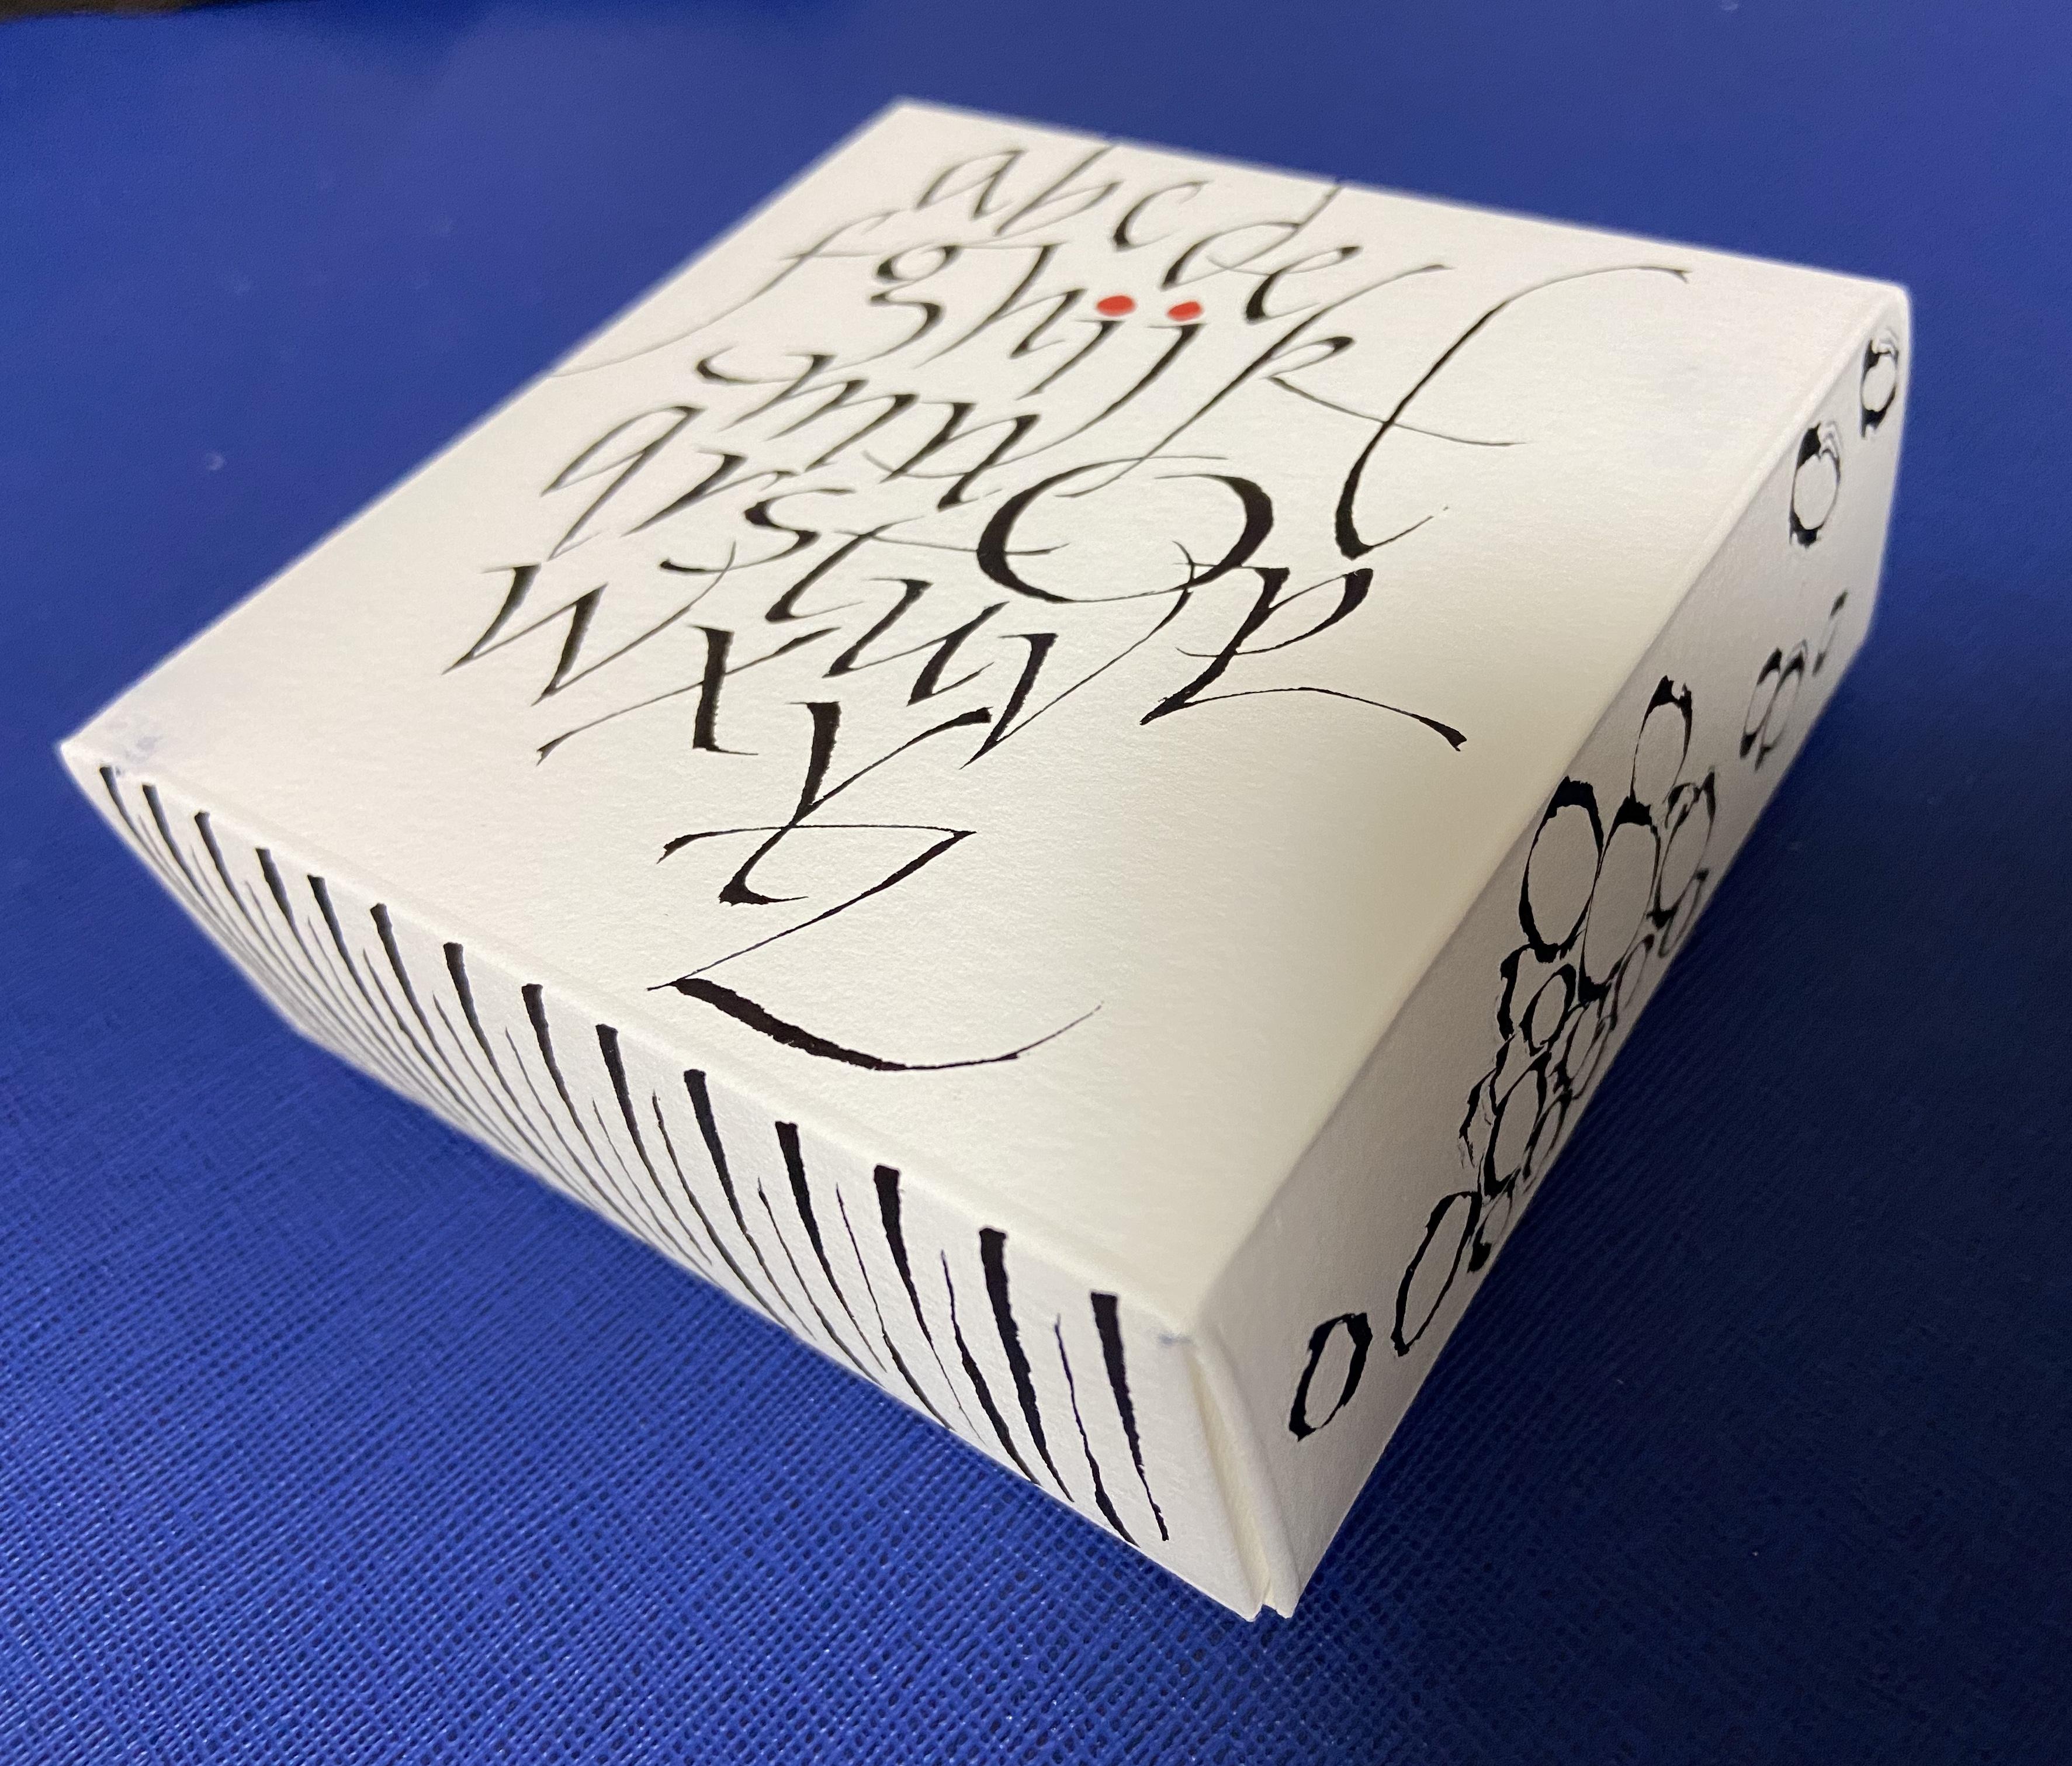 Enjoy Calligraphy